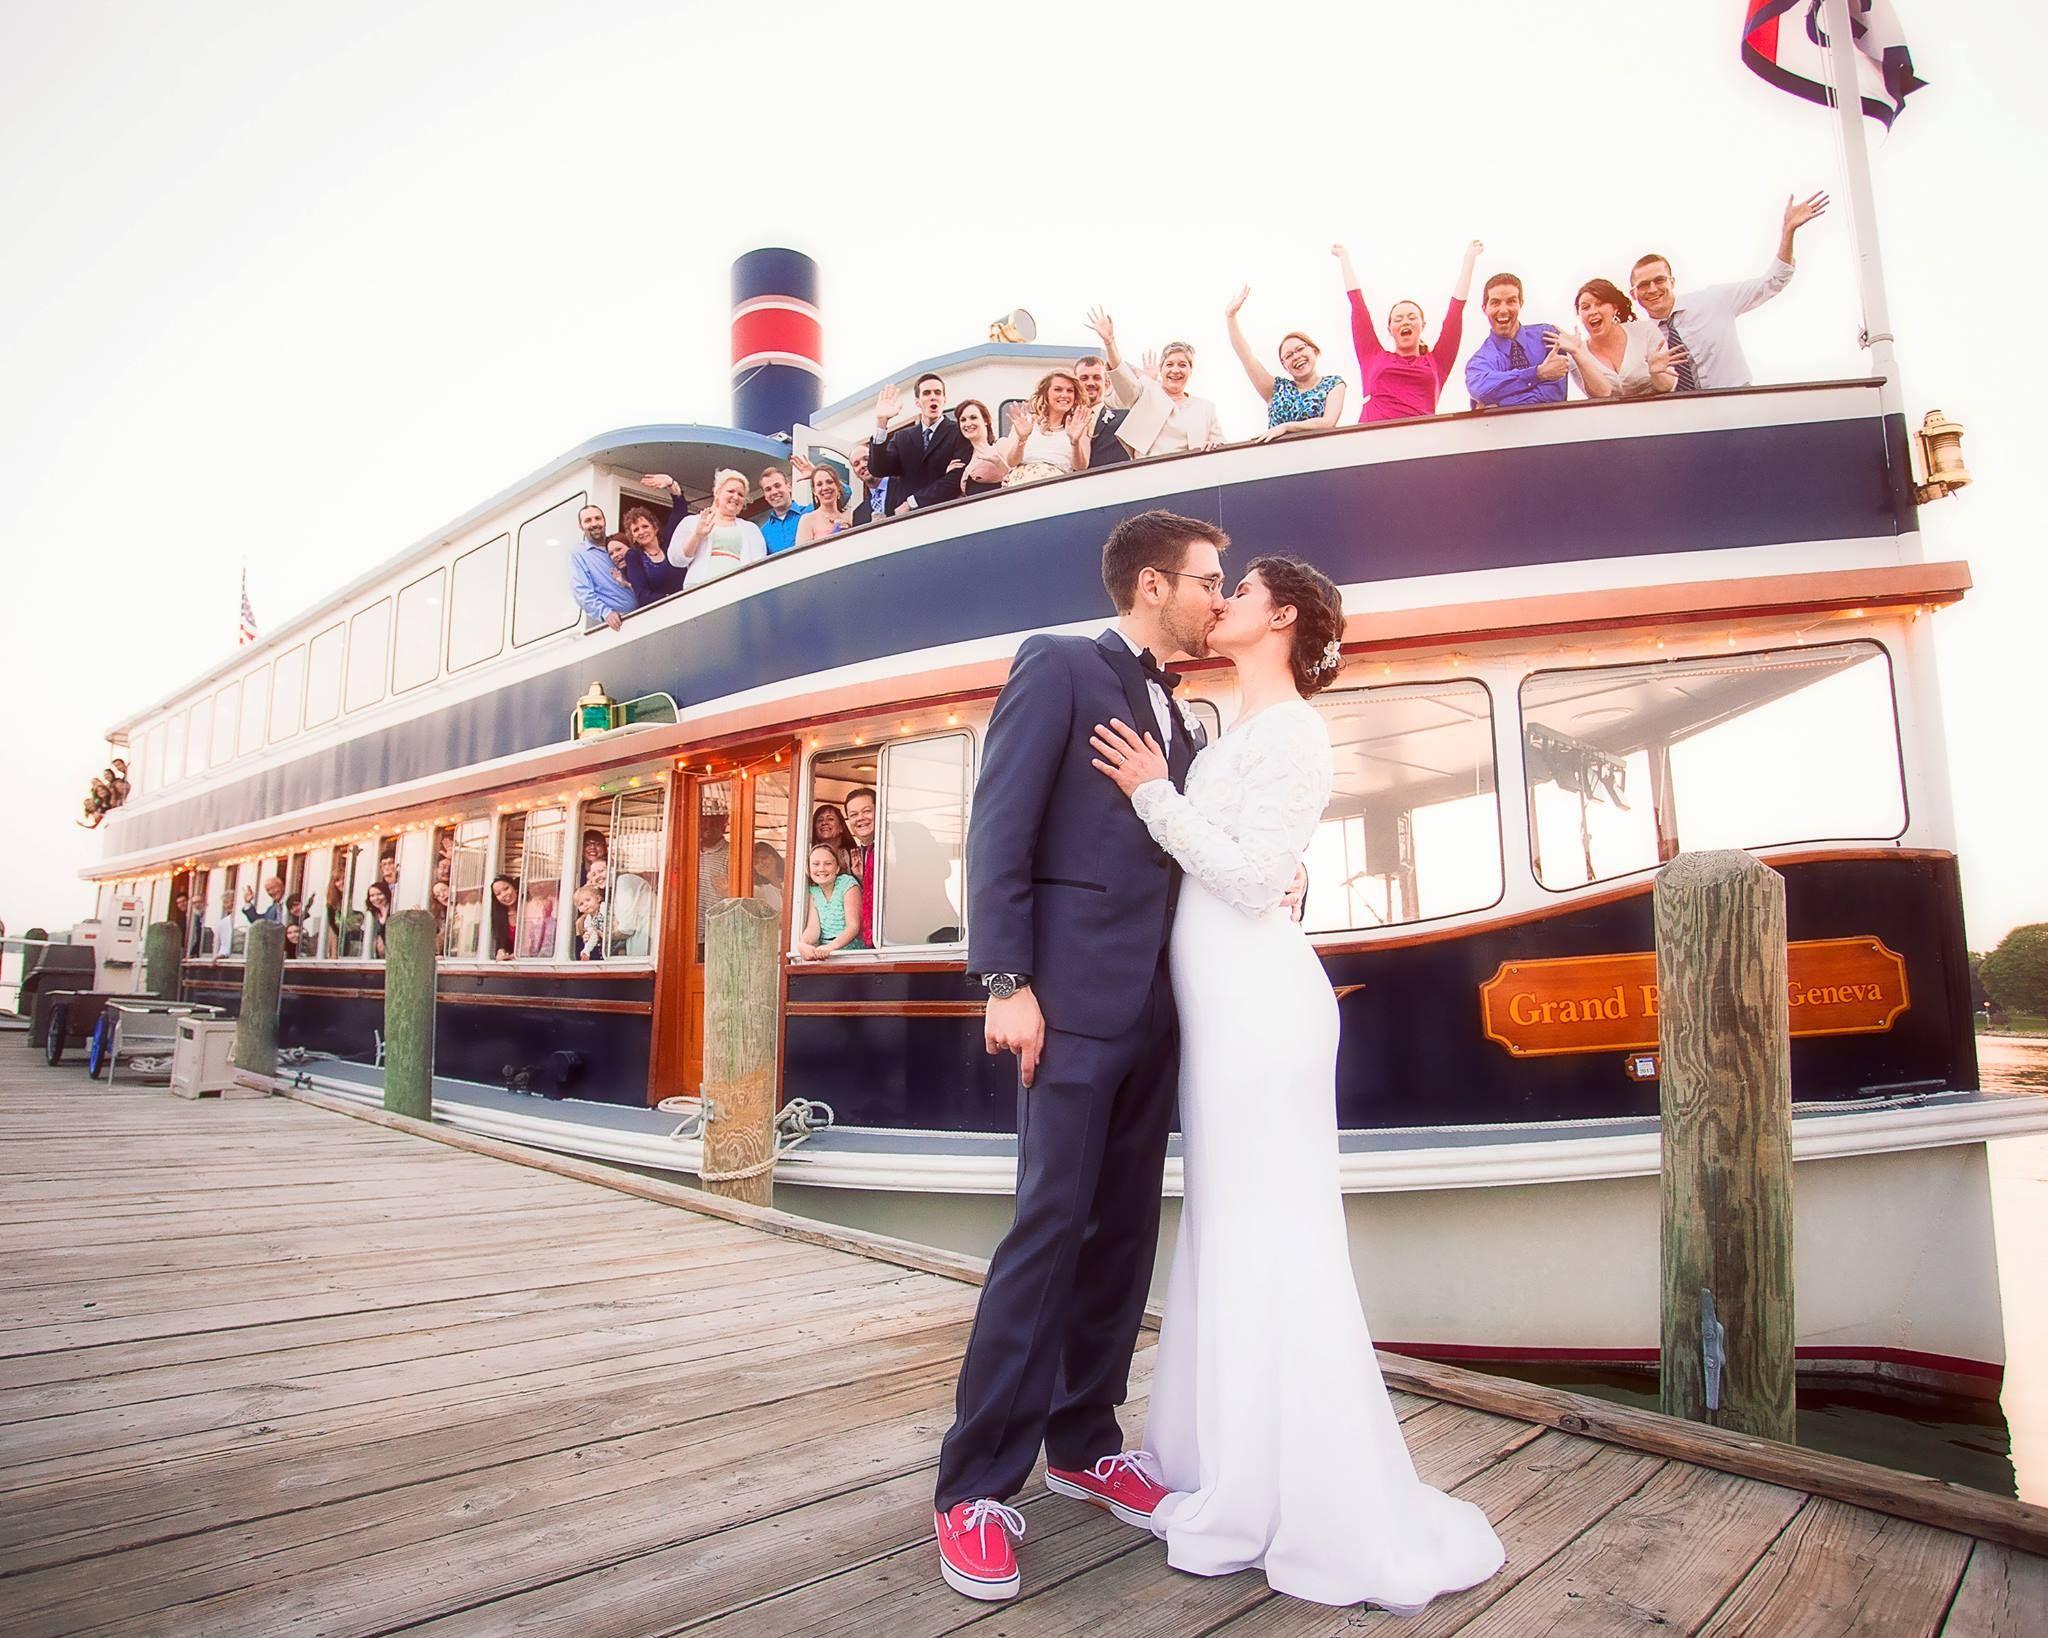 Wedding On A Boat Jordan Imhoff Photography Https M Facebook